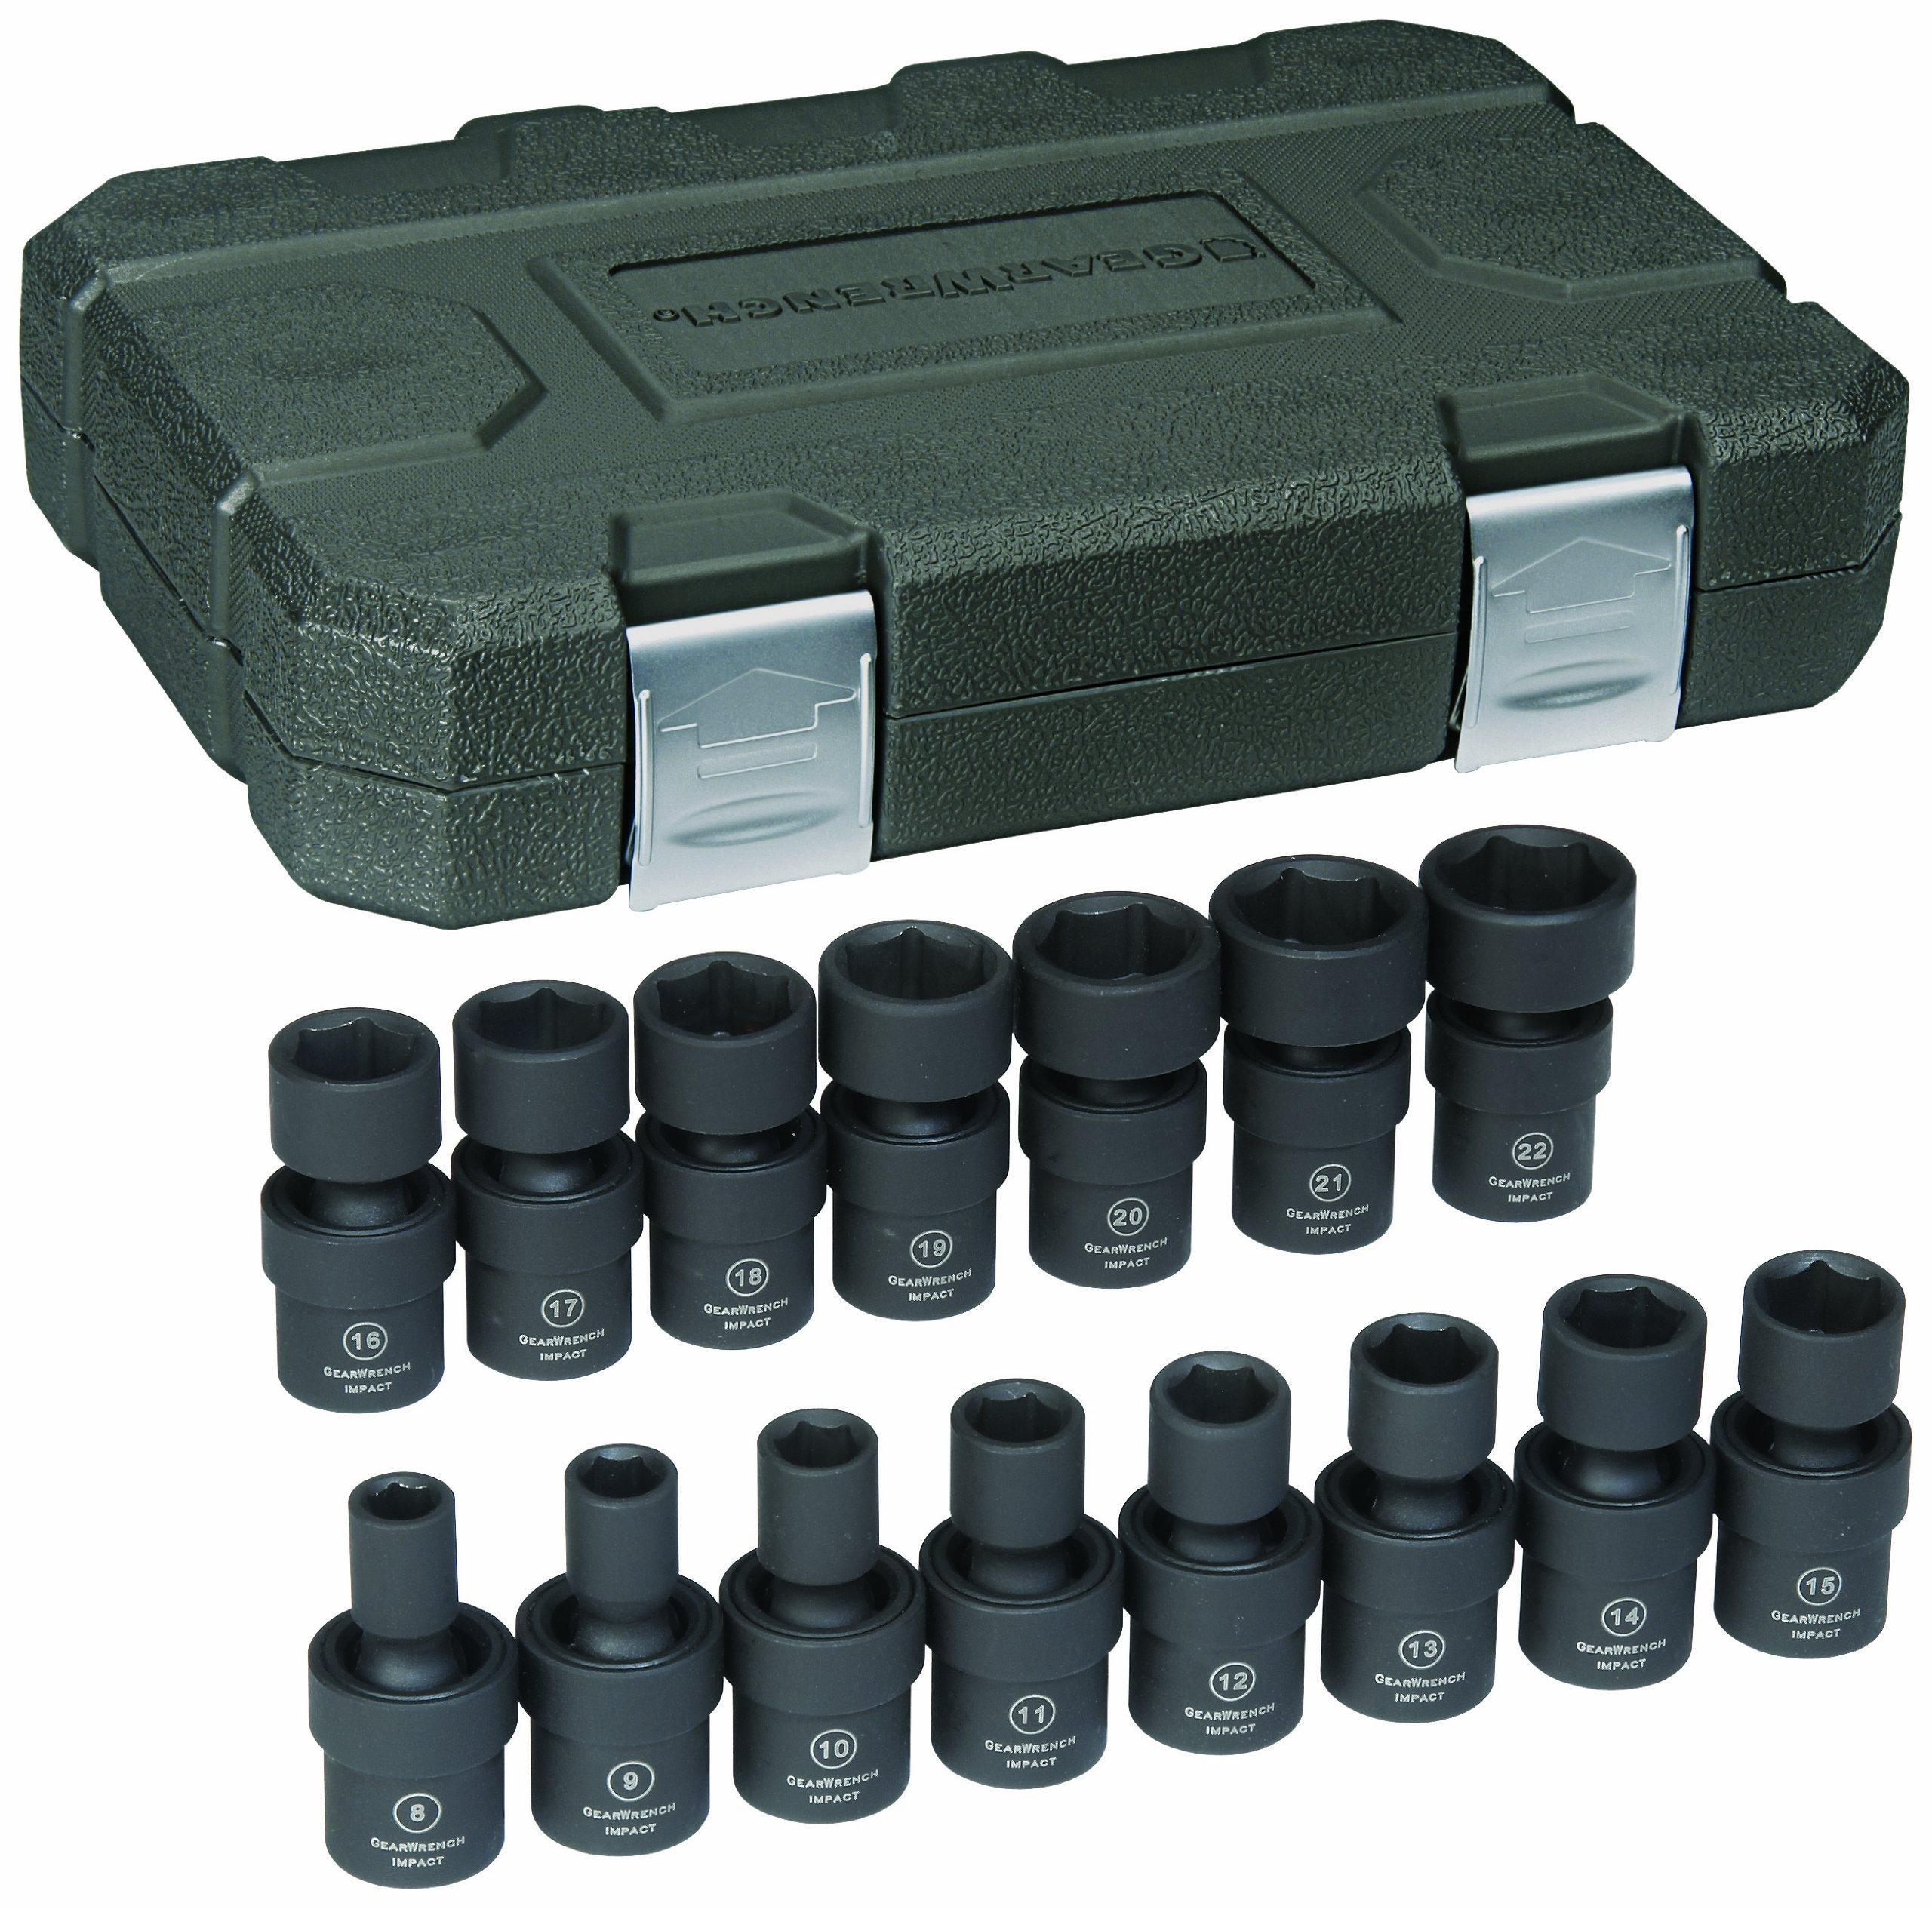 GearWrench 84918 3/8-Inch Drive Universal Impact Socket Set Metric, 15-Piece